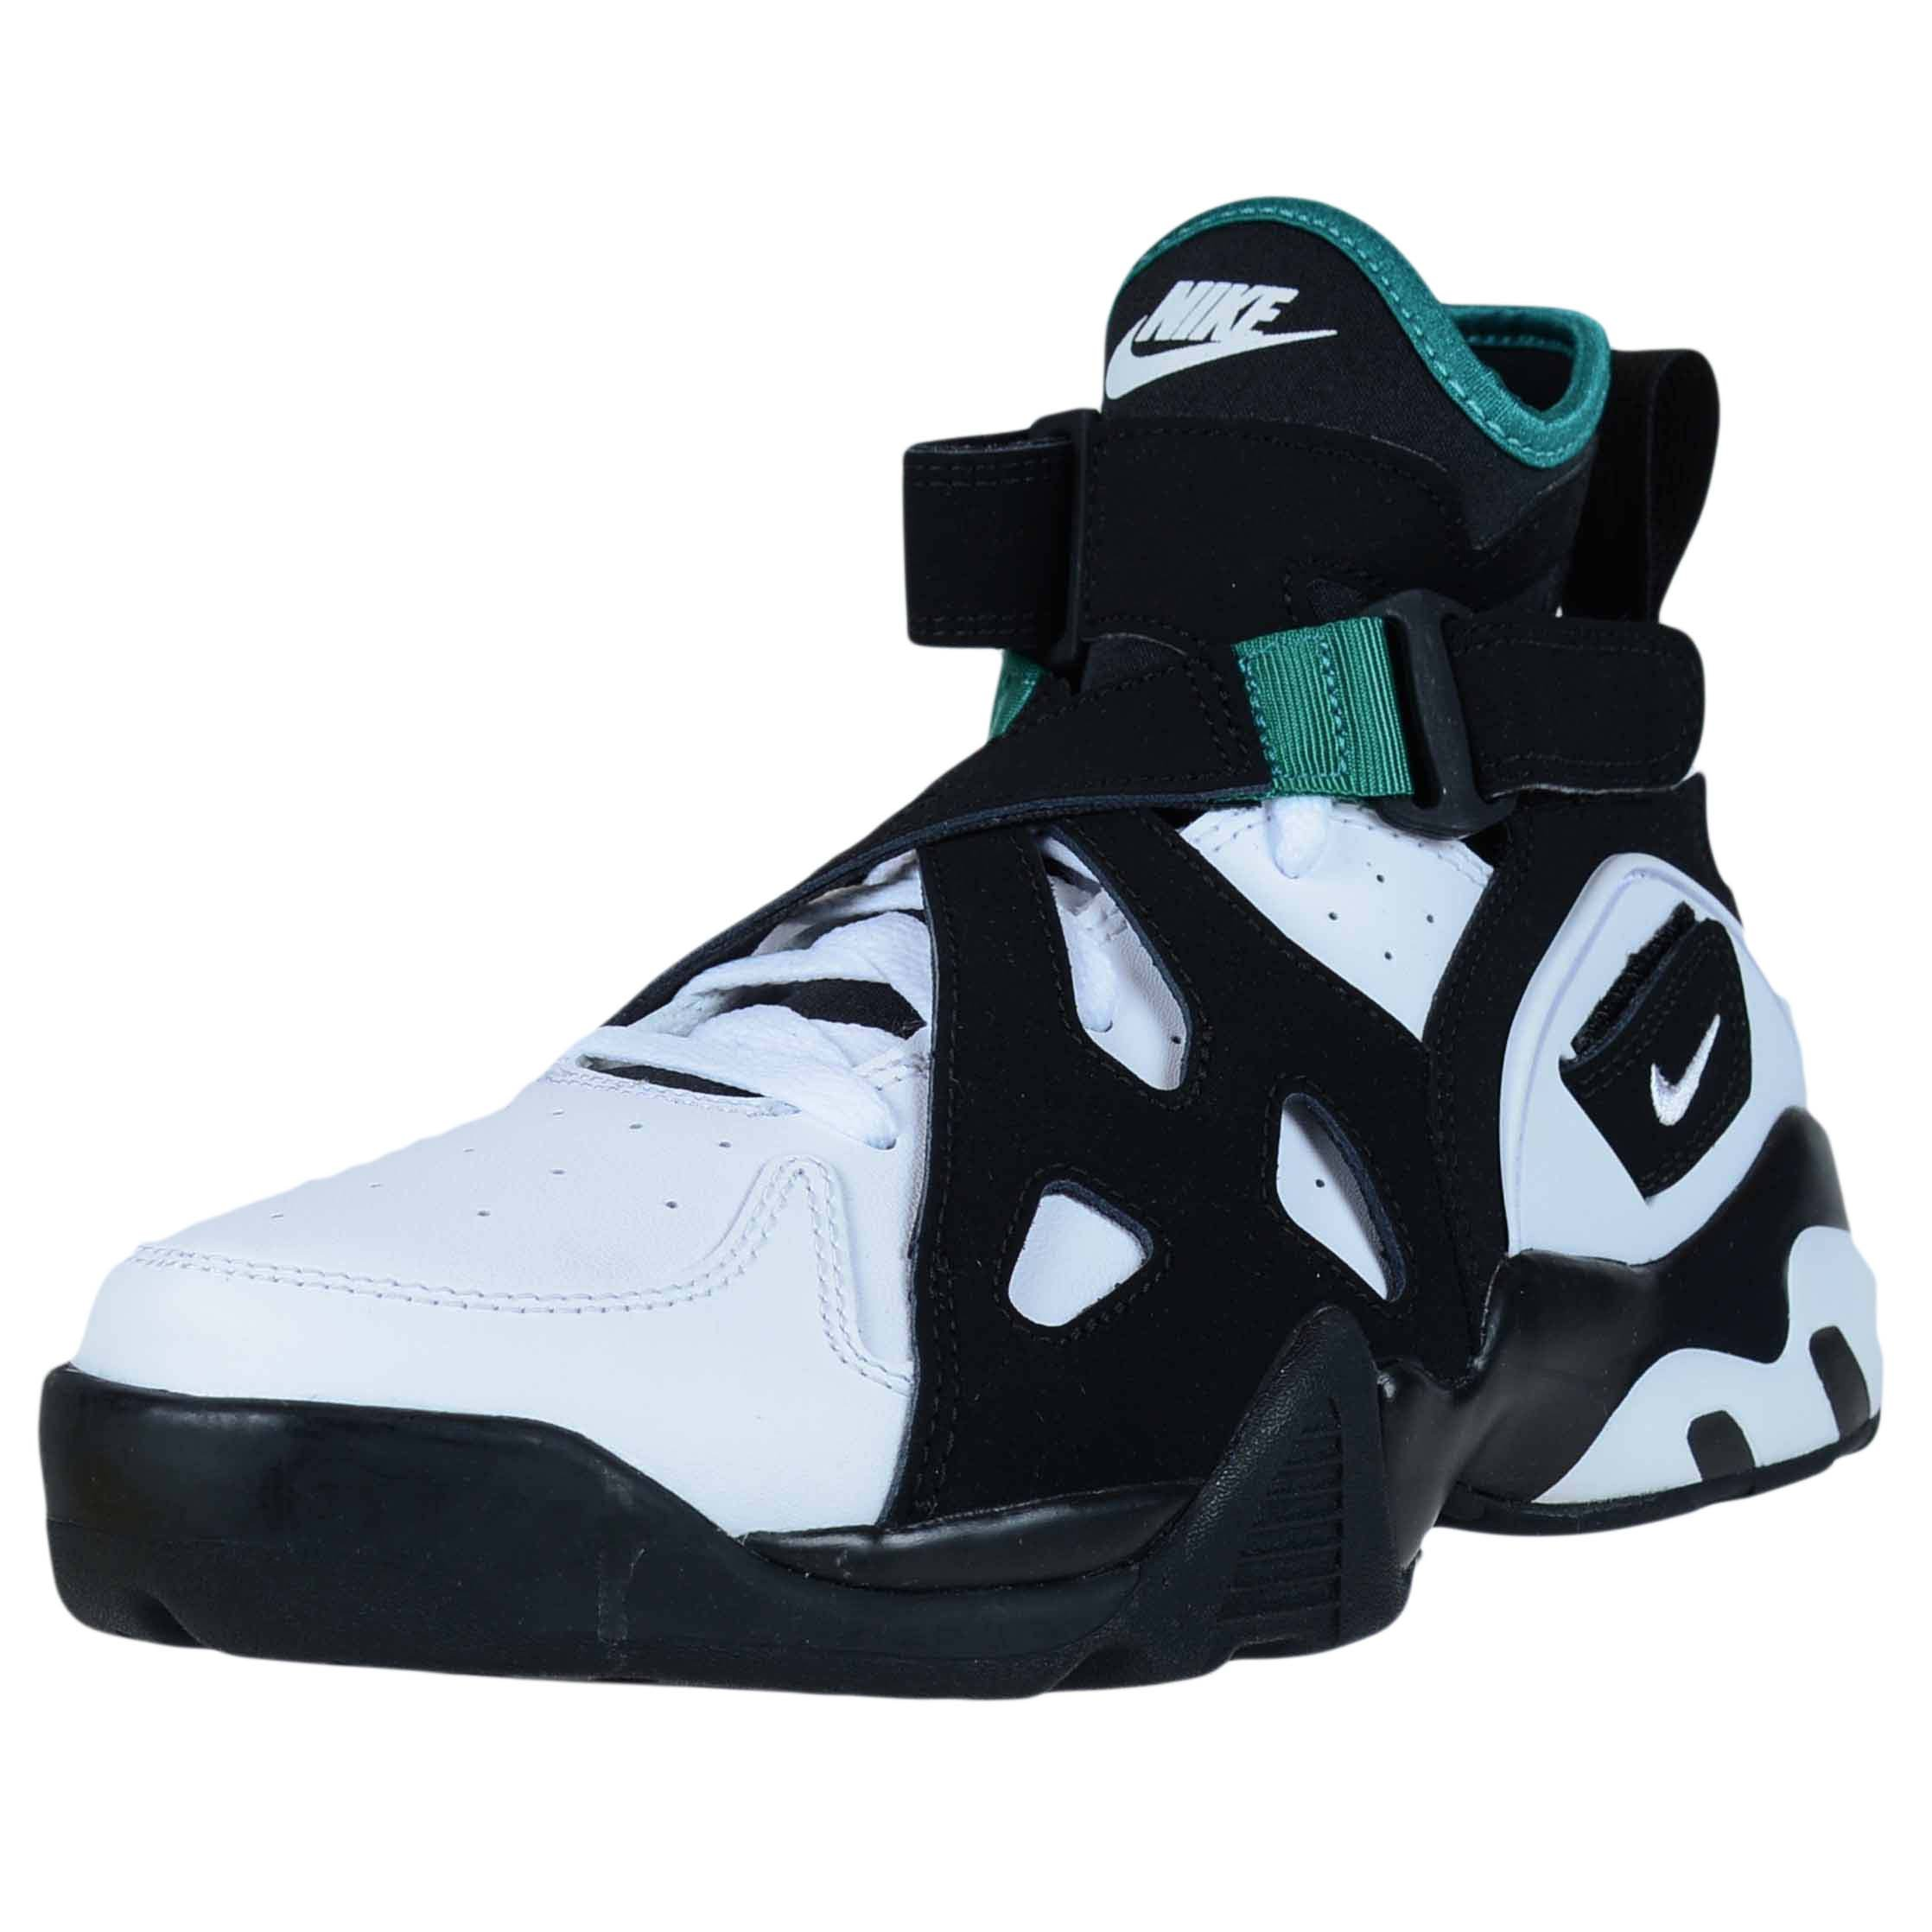 purchase cheap df9f4 bf606 Galleon - NIKE AIR Unlimited Black White Emerald Green David Robinson  889013 001